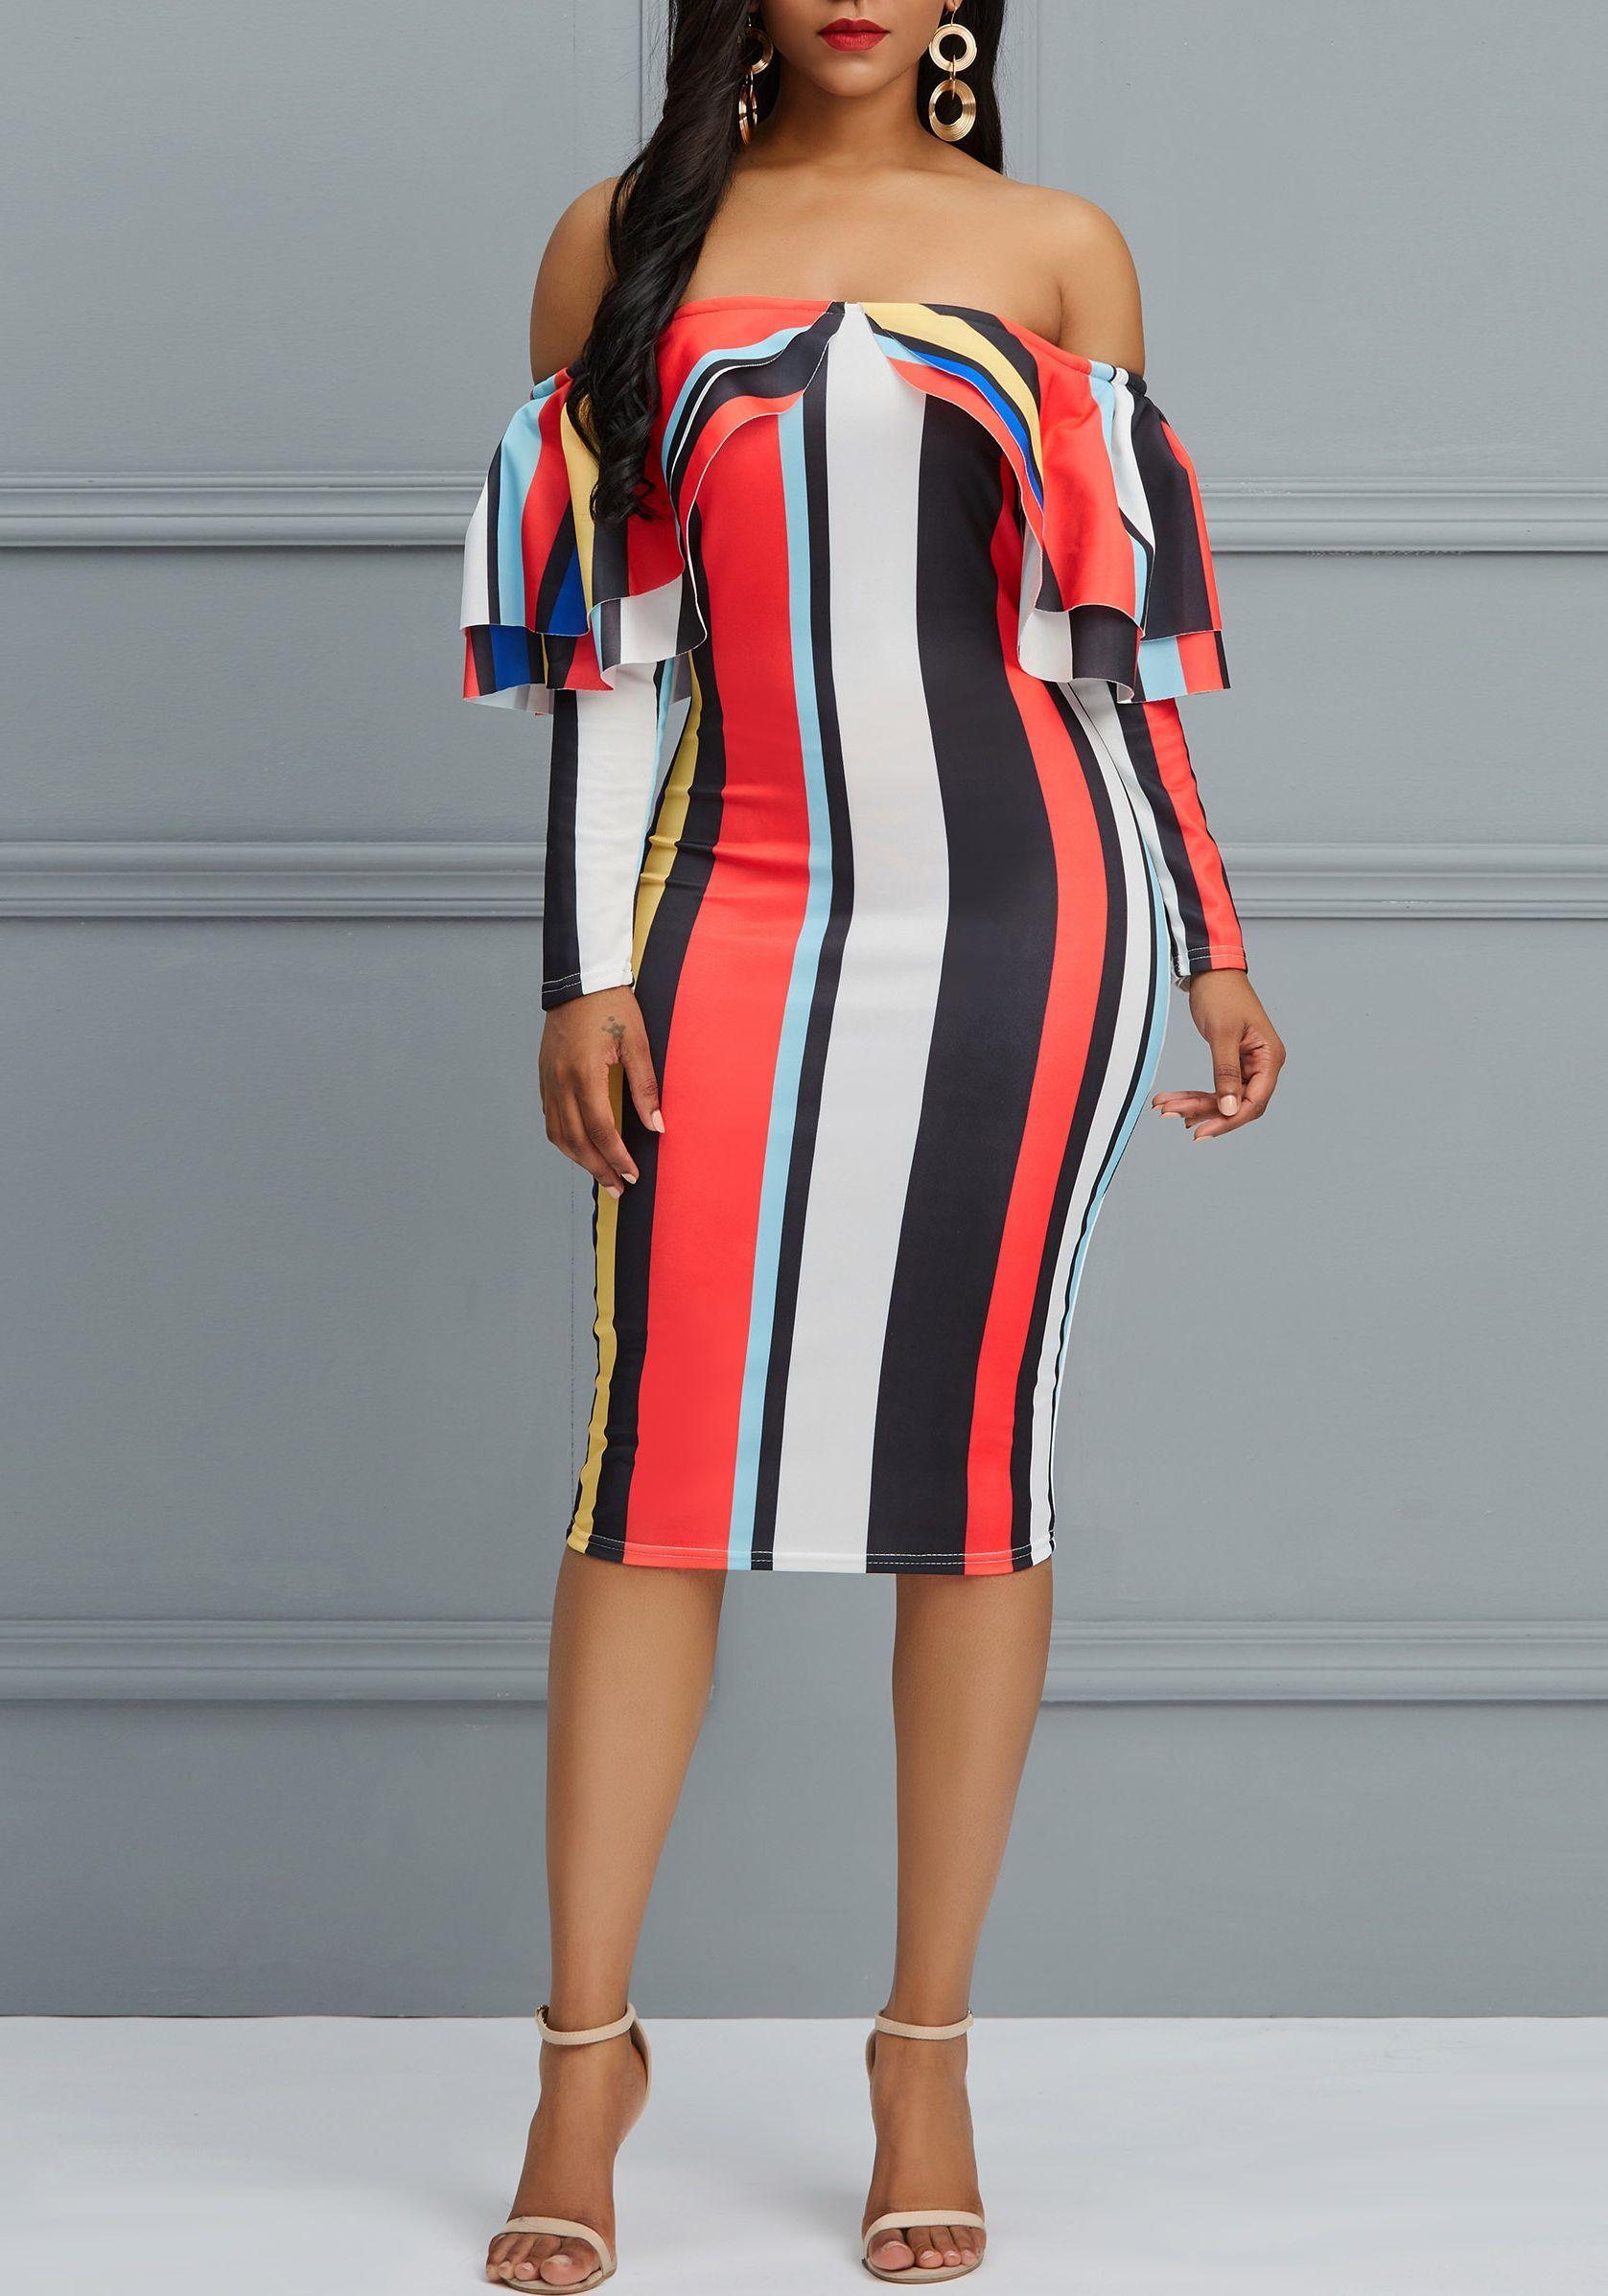 f34e57f58aa4 Falbala Backless Single Women's Bodycon Dress | Shoespie Dresses ...